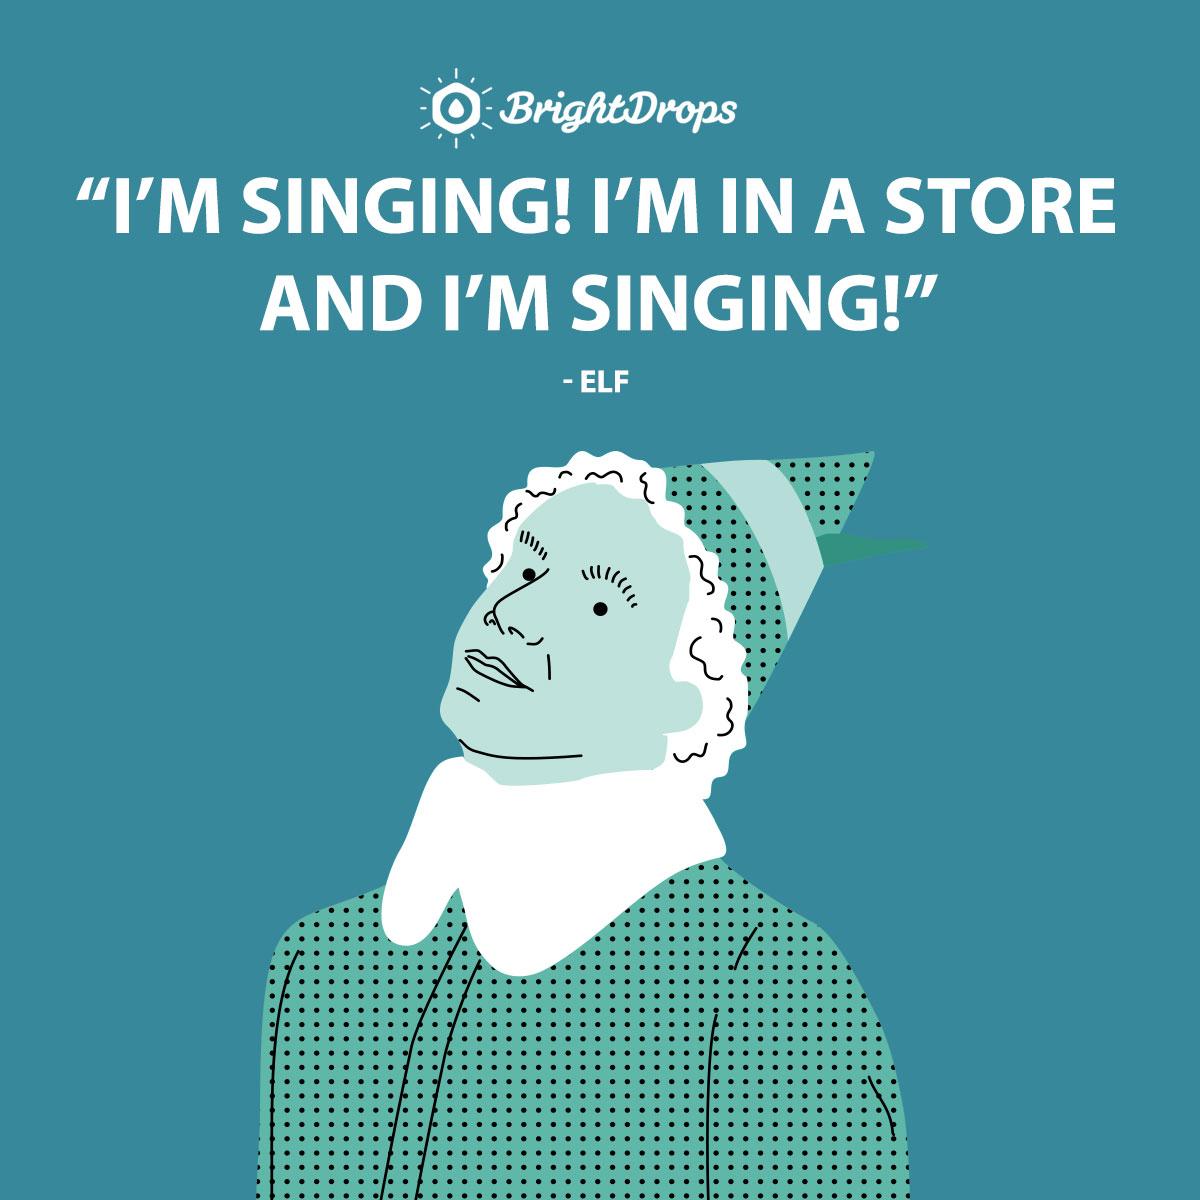 I'm singing! I'm in a store and I'm singing! - Elf